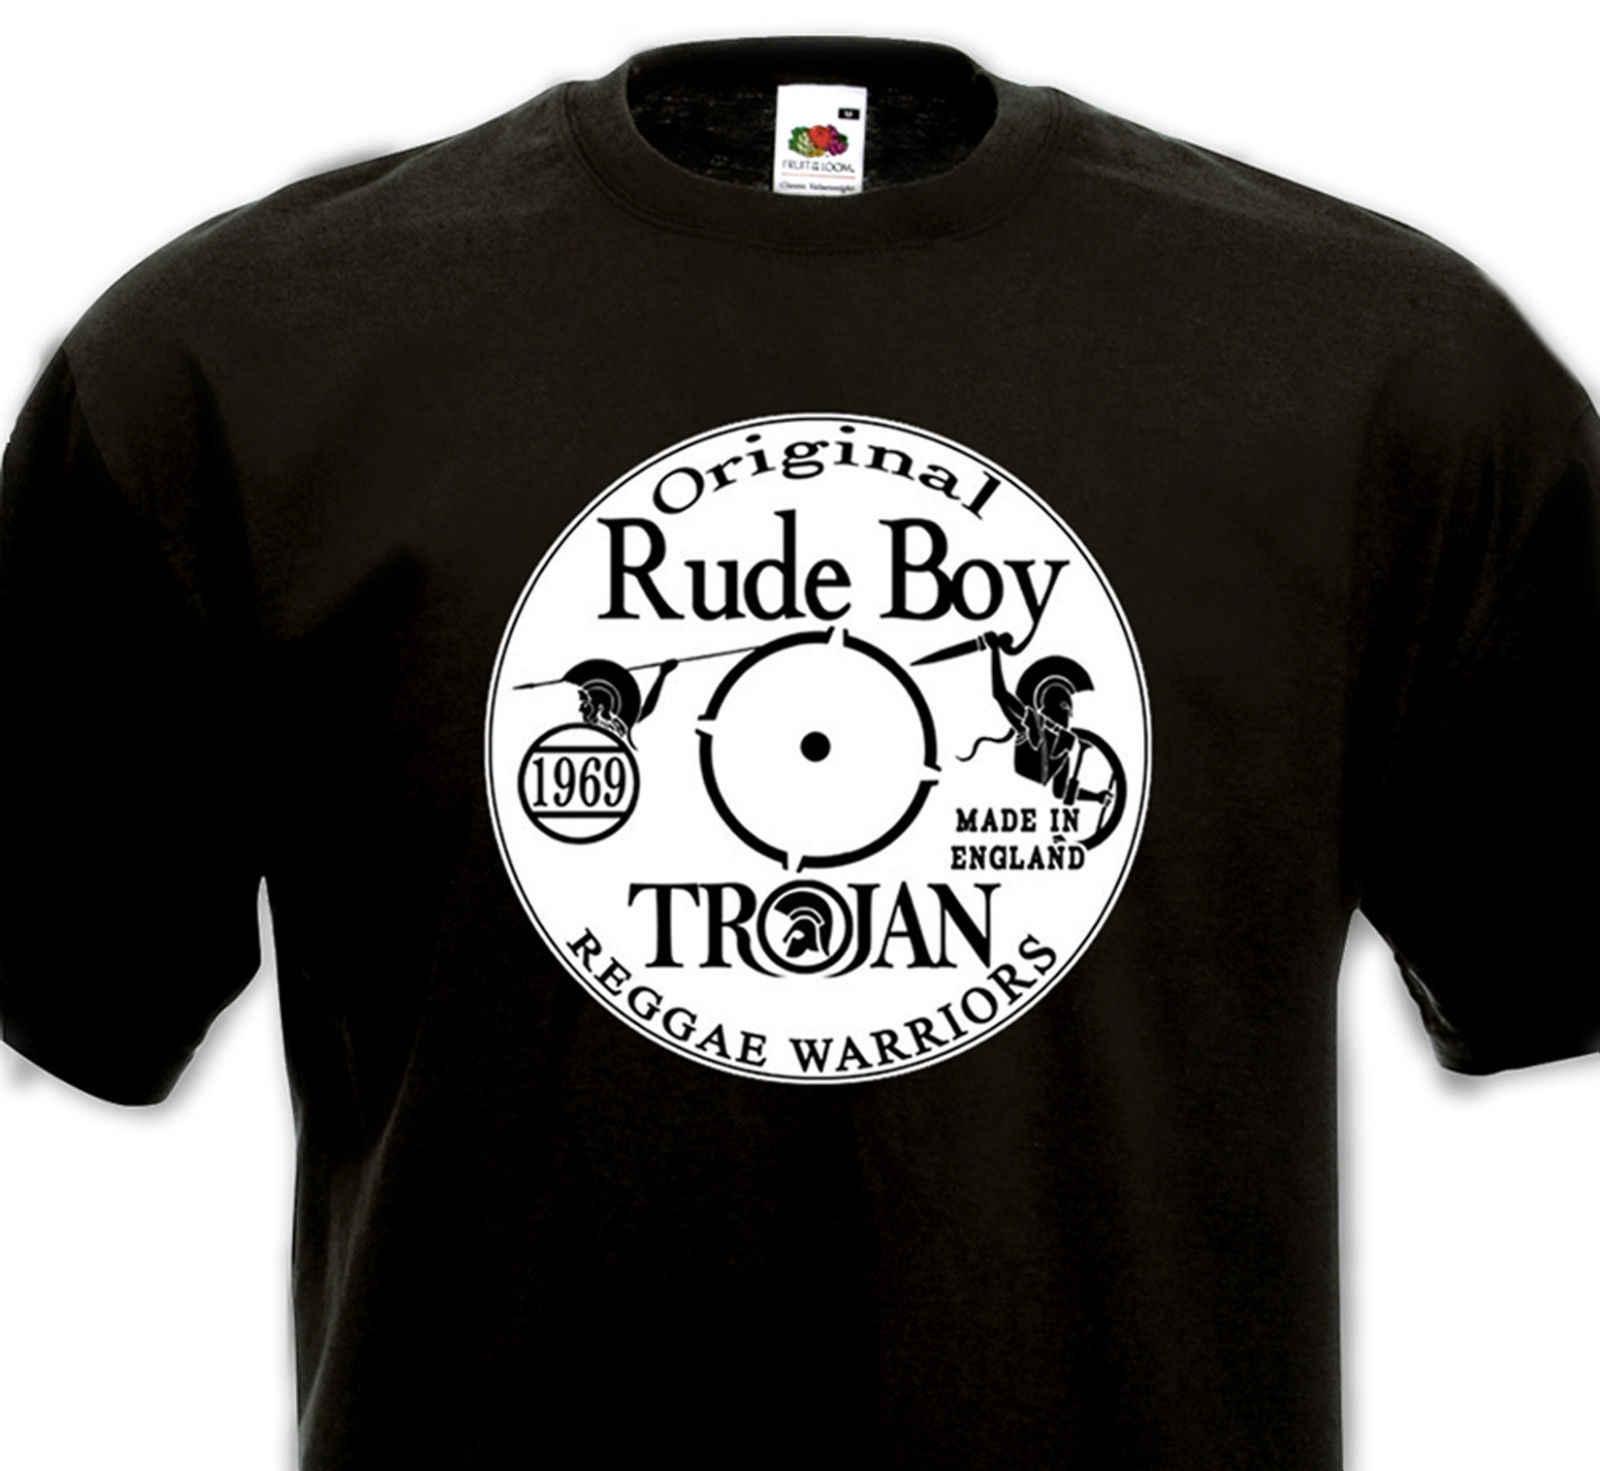 59d7715c2 T-SHIRT Original Rude Boy - Ska Reggae Dub Vinyl Trojan Studio 1 Coxsone -